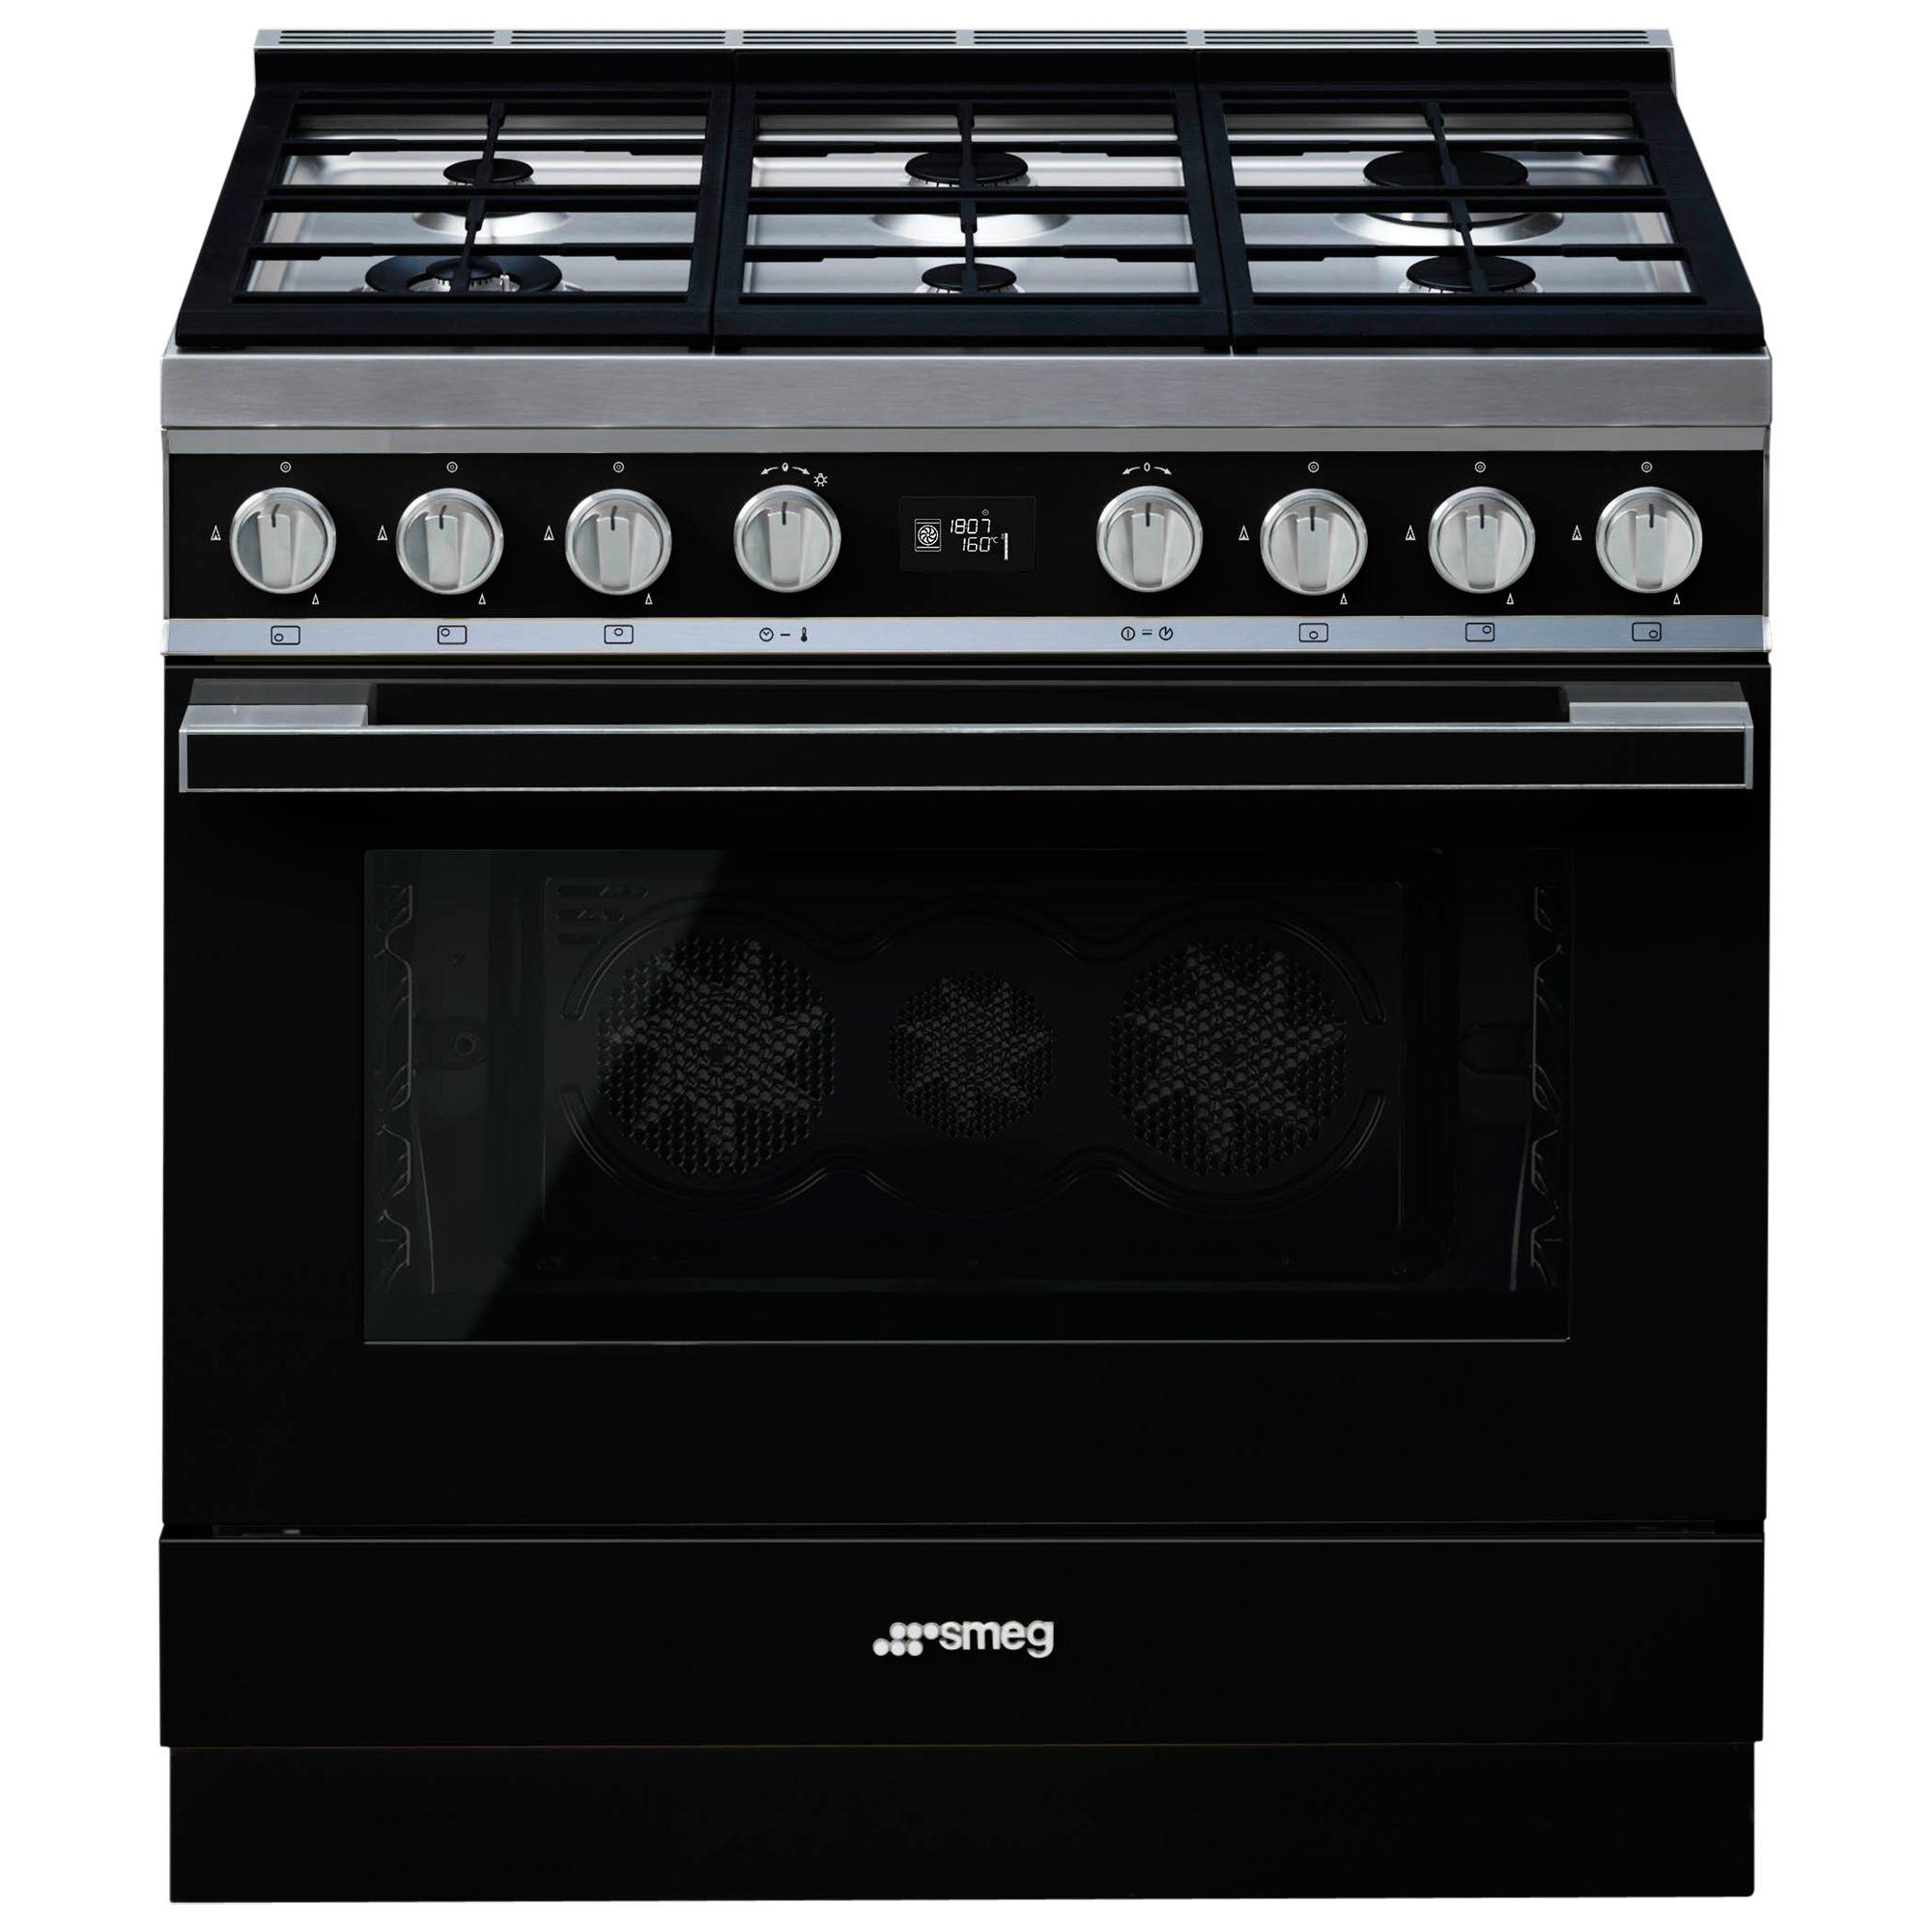 Smeg Portofino CPF9G Dual Fuel Range Cooker, A+ Energy Rating,